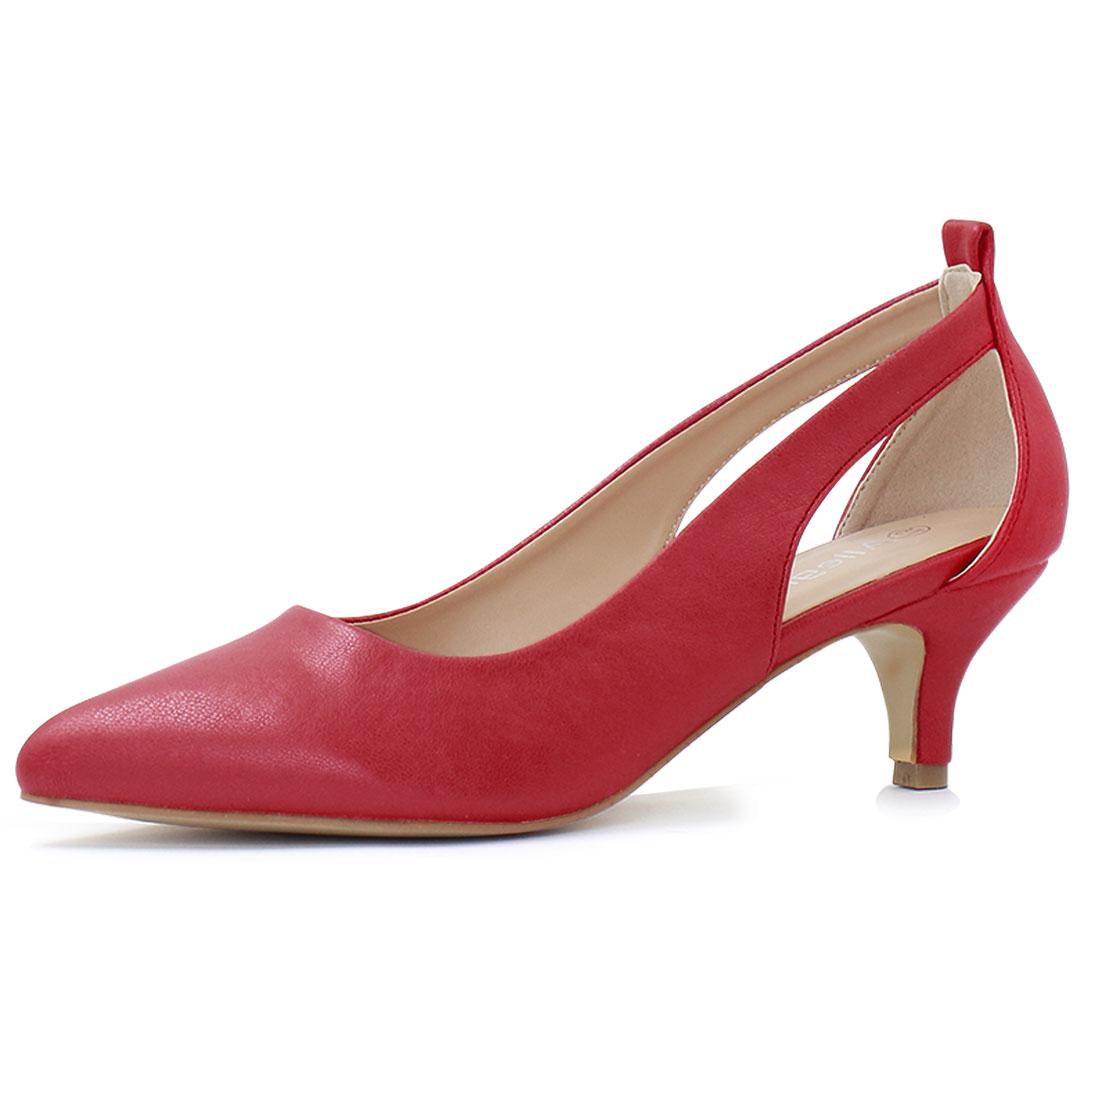 Allegra K Women's Cutout Sides Pointed Toe Kitten Heel Pumps Red US 7.5